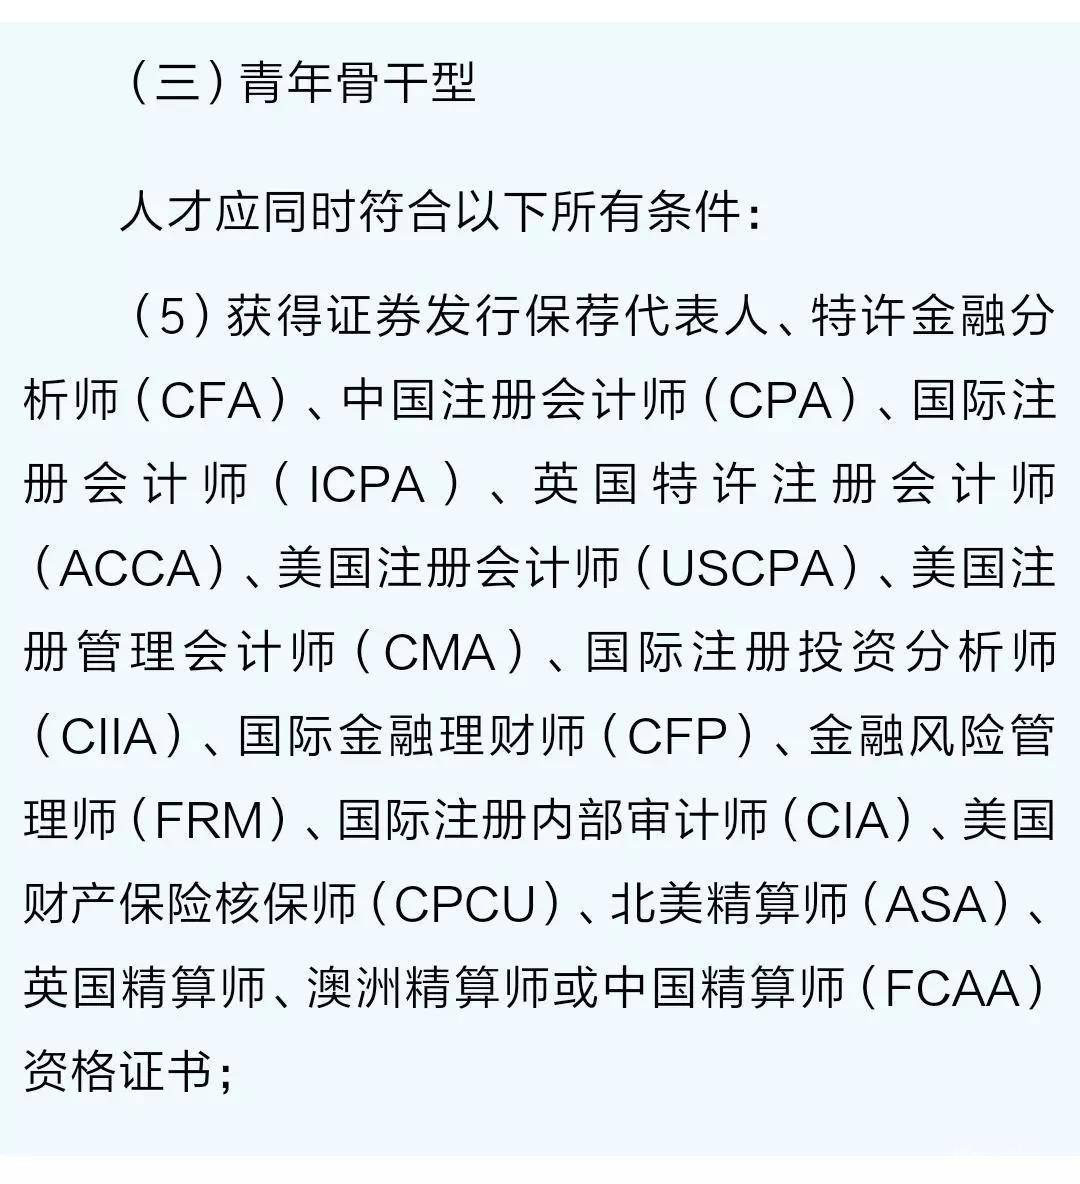 ACCA持证者最高可享20万补助!